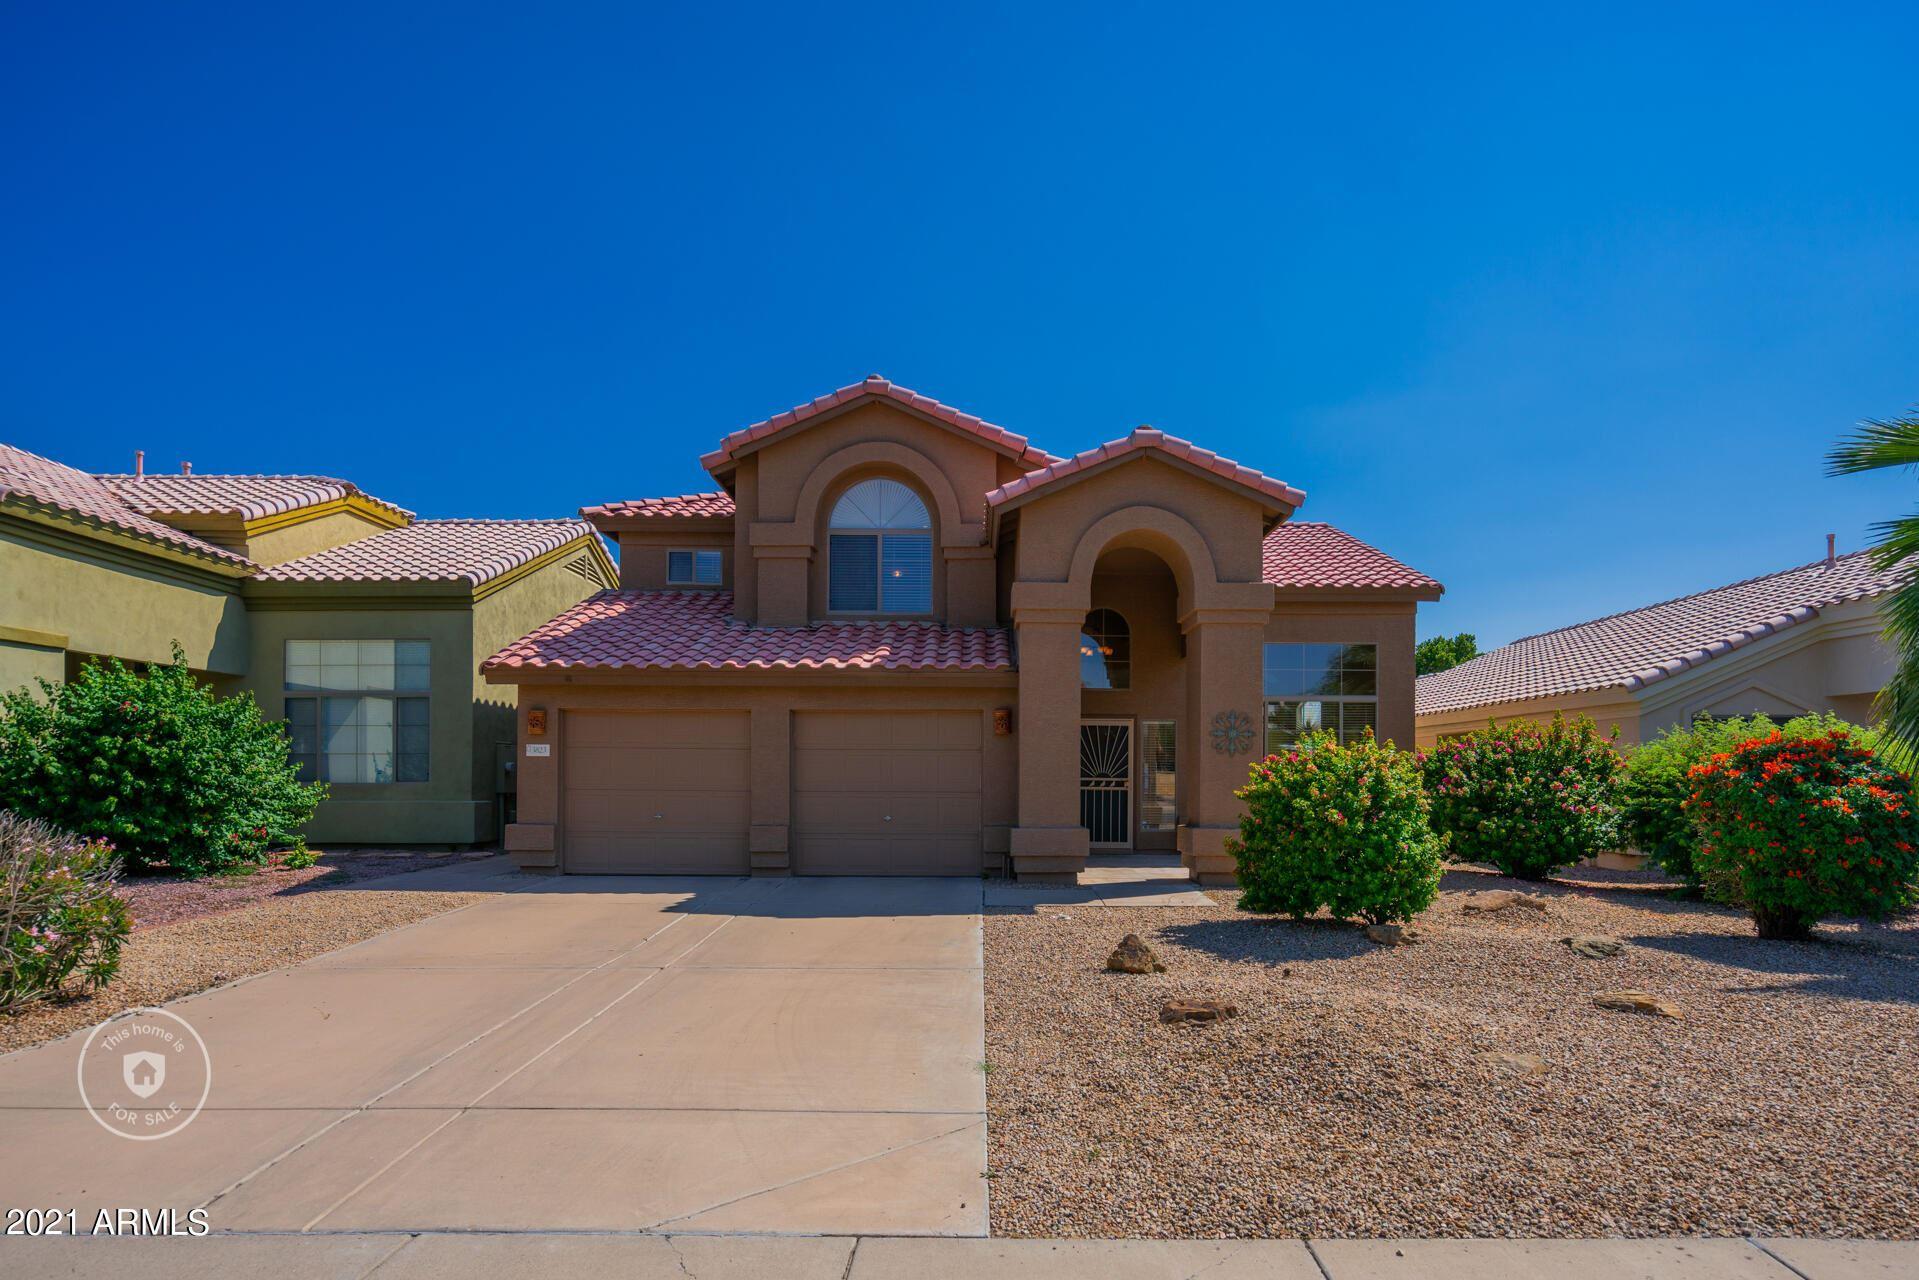 3823 E EDNA Avenue, Phoenix, AZ 85032 - MLS#: 6285026